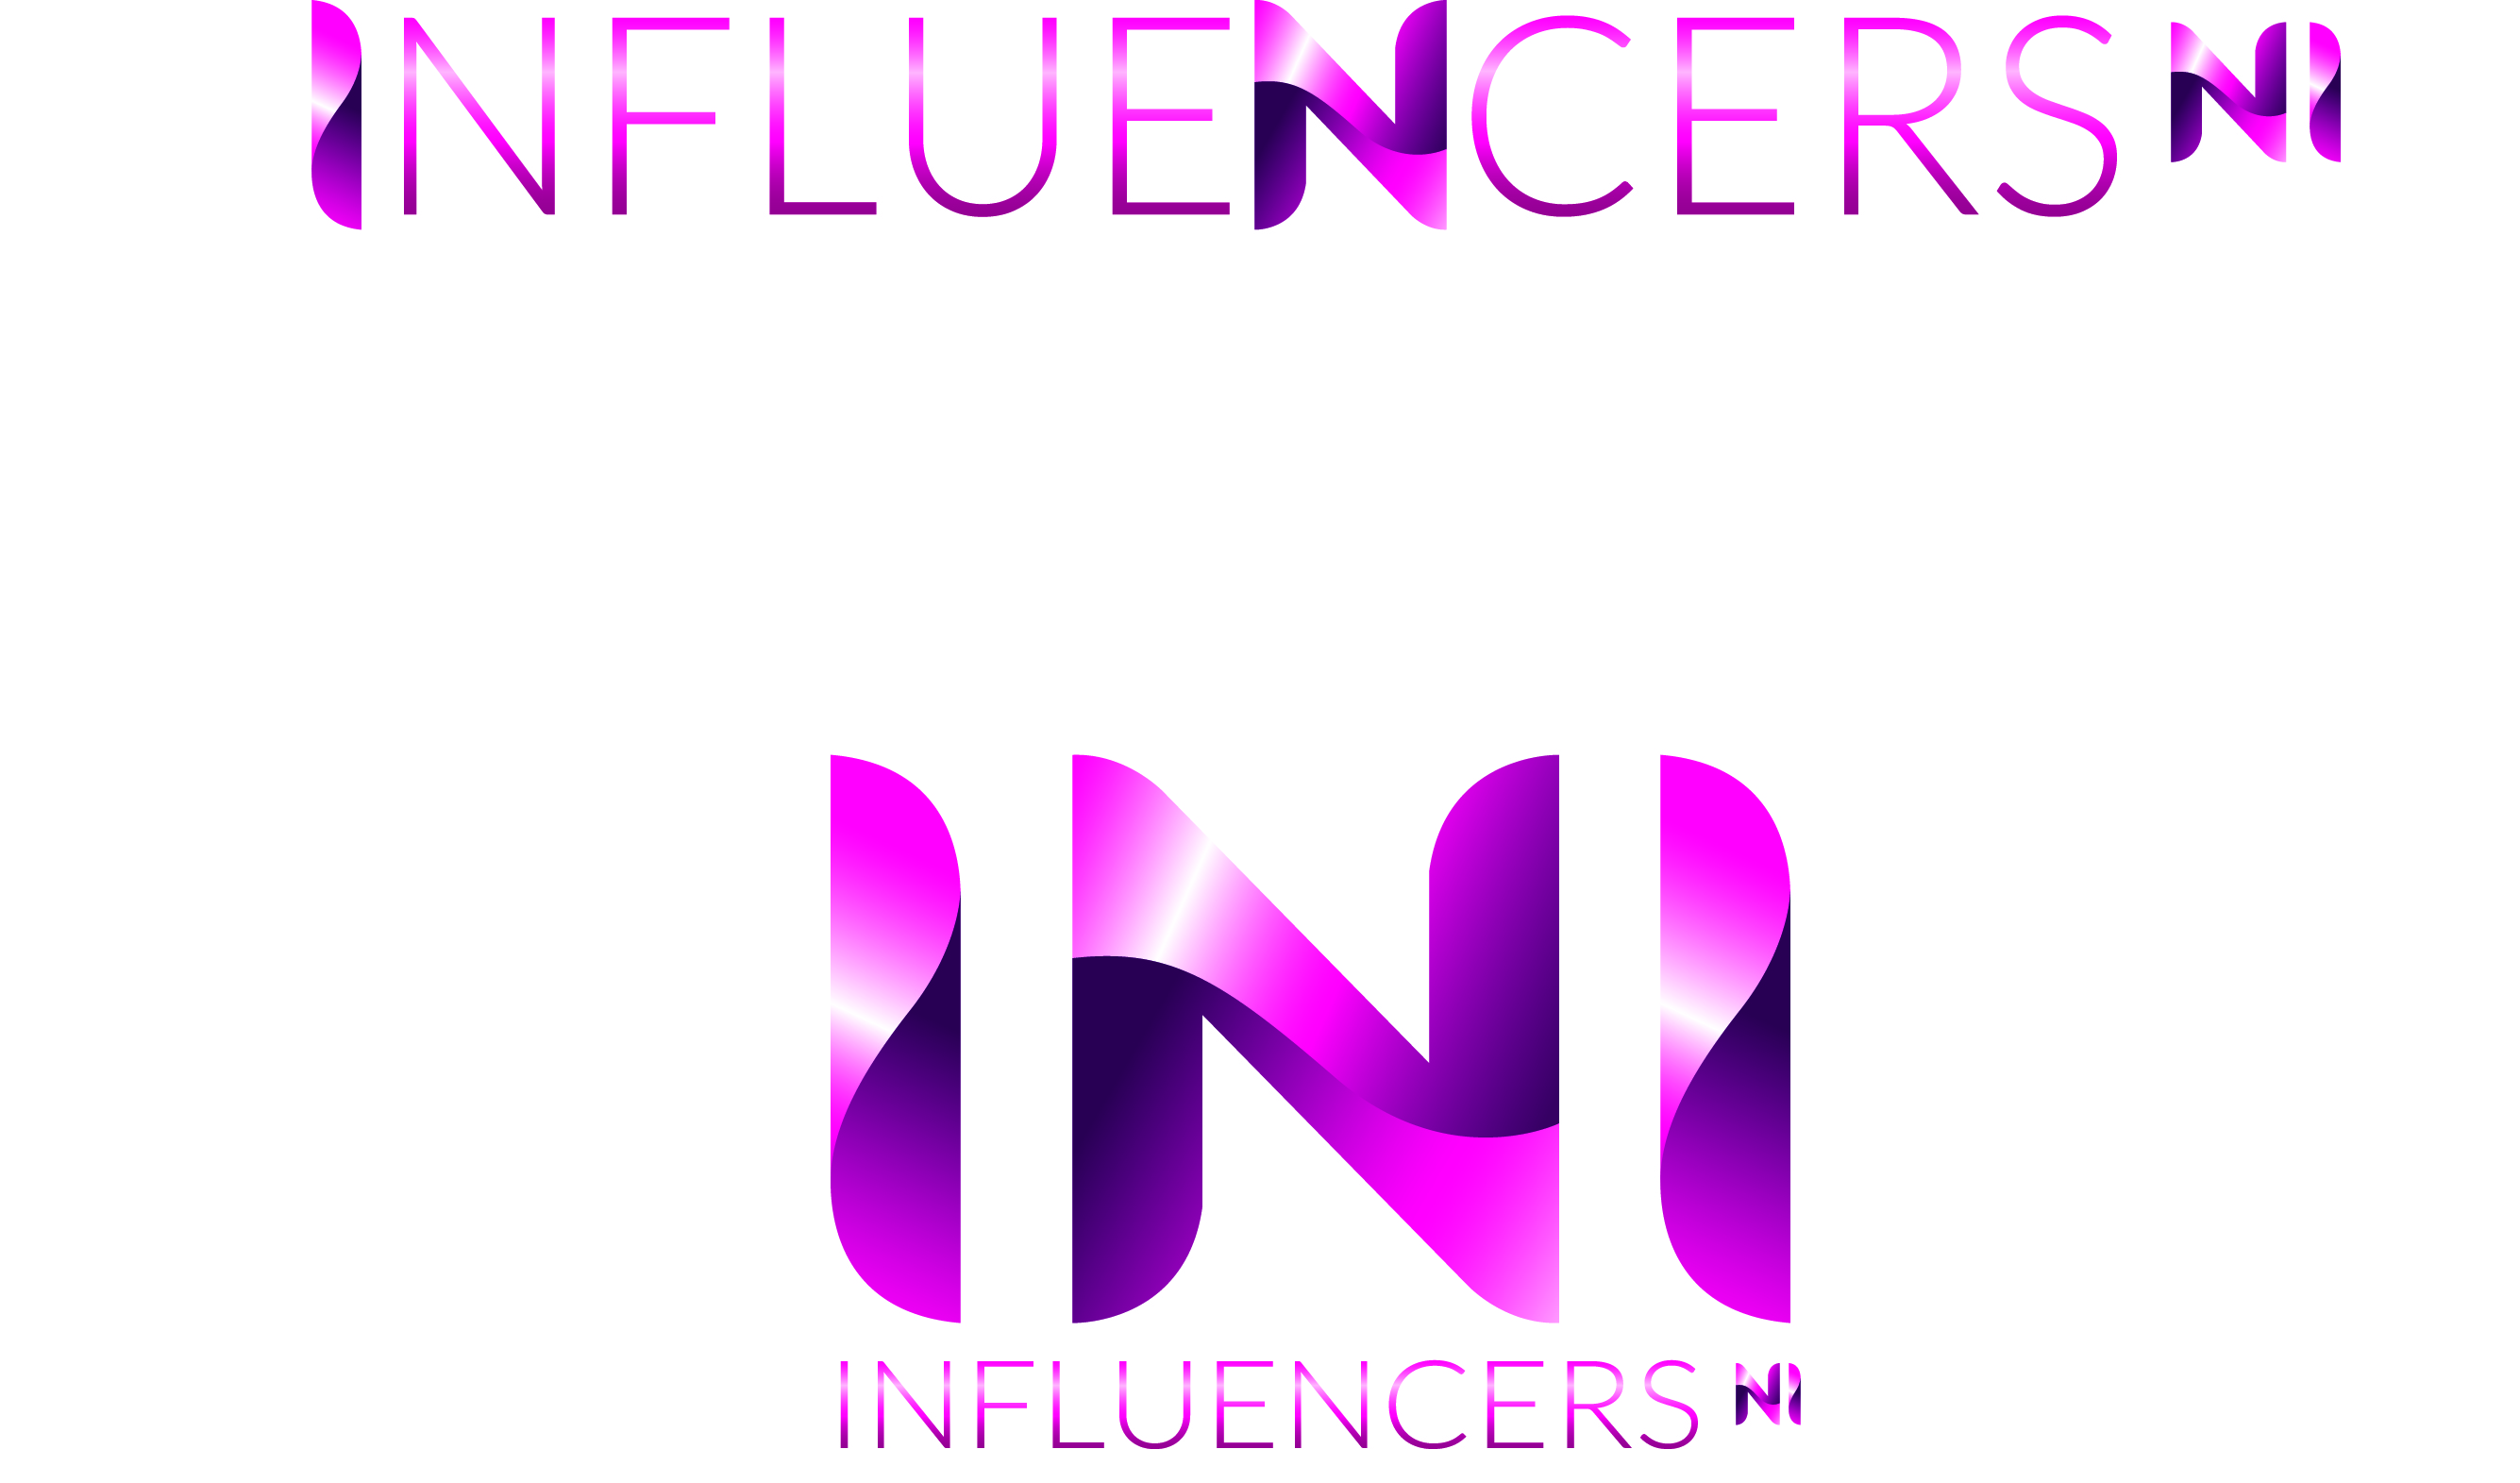 Influencers NI1